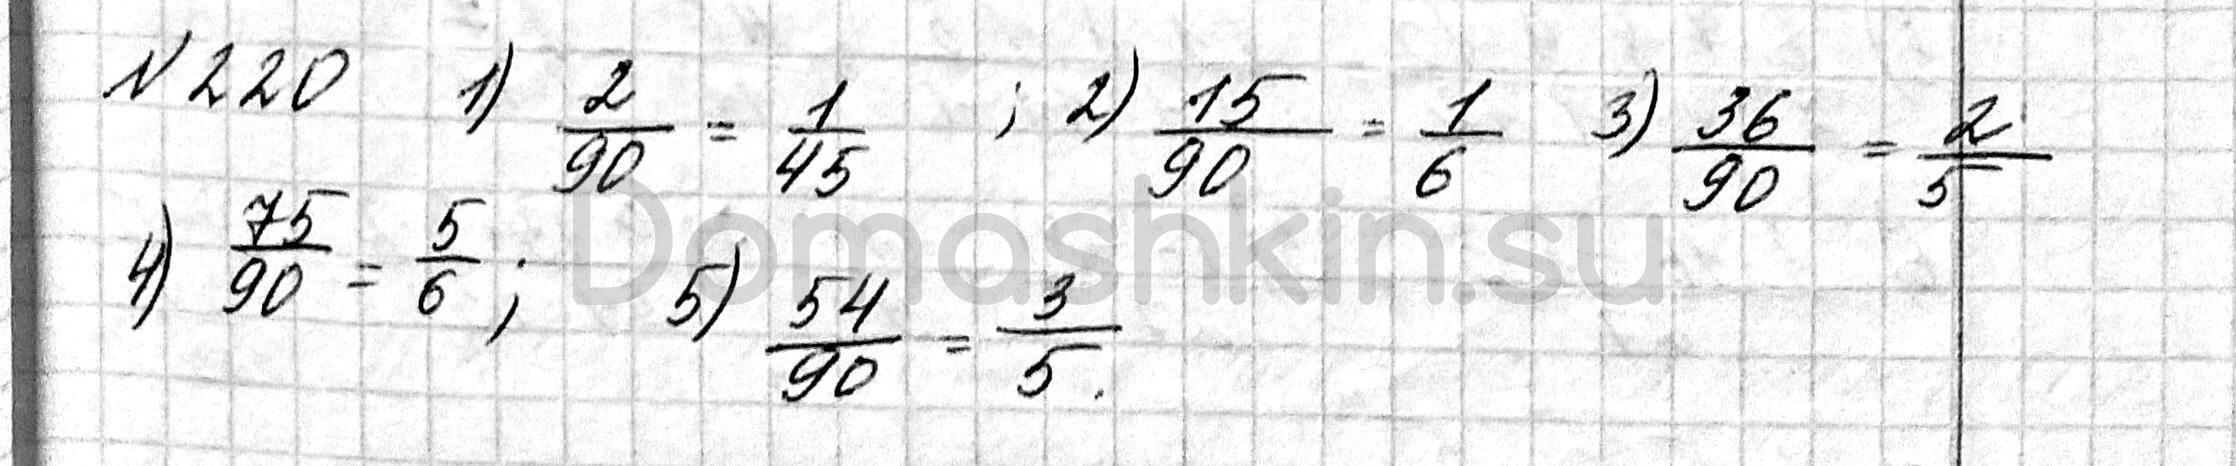 Математика 6 класс учебник Мерзляк номер 220 решение